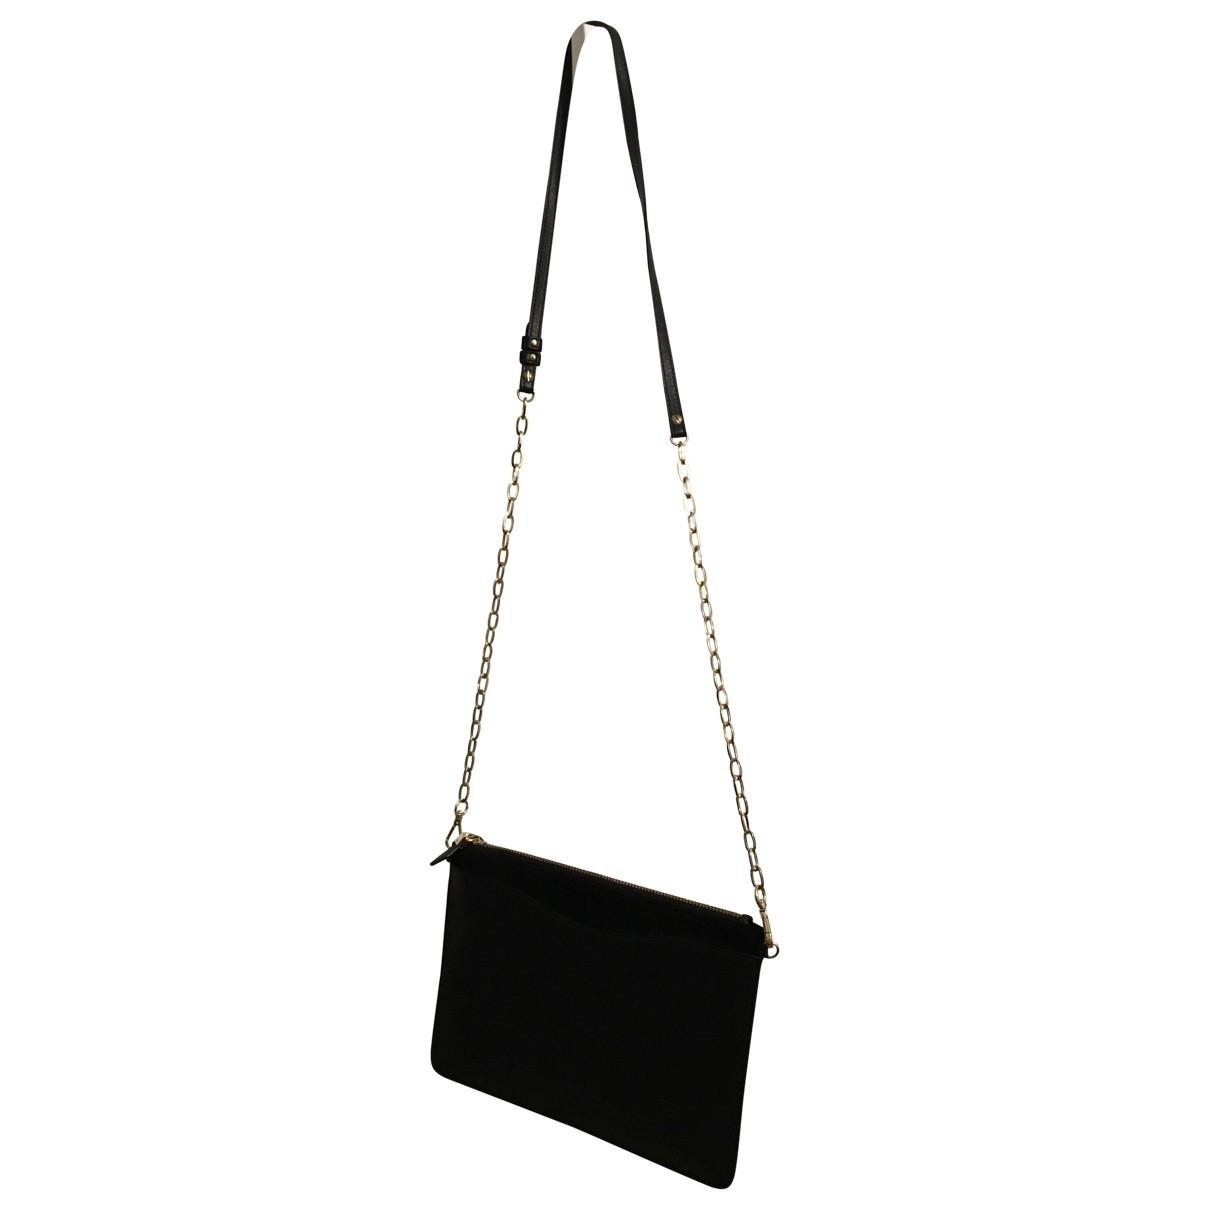 Lk Bennett \N Black Leather Clutch bag for Women \N